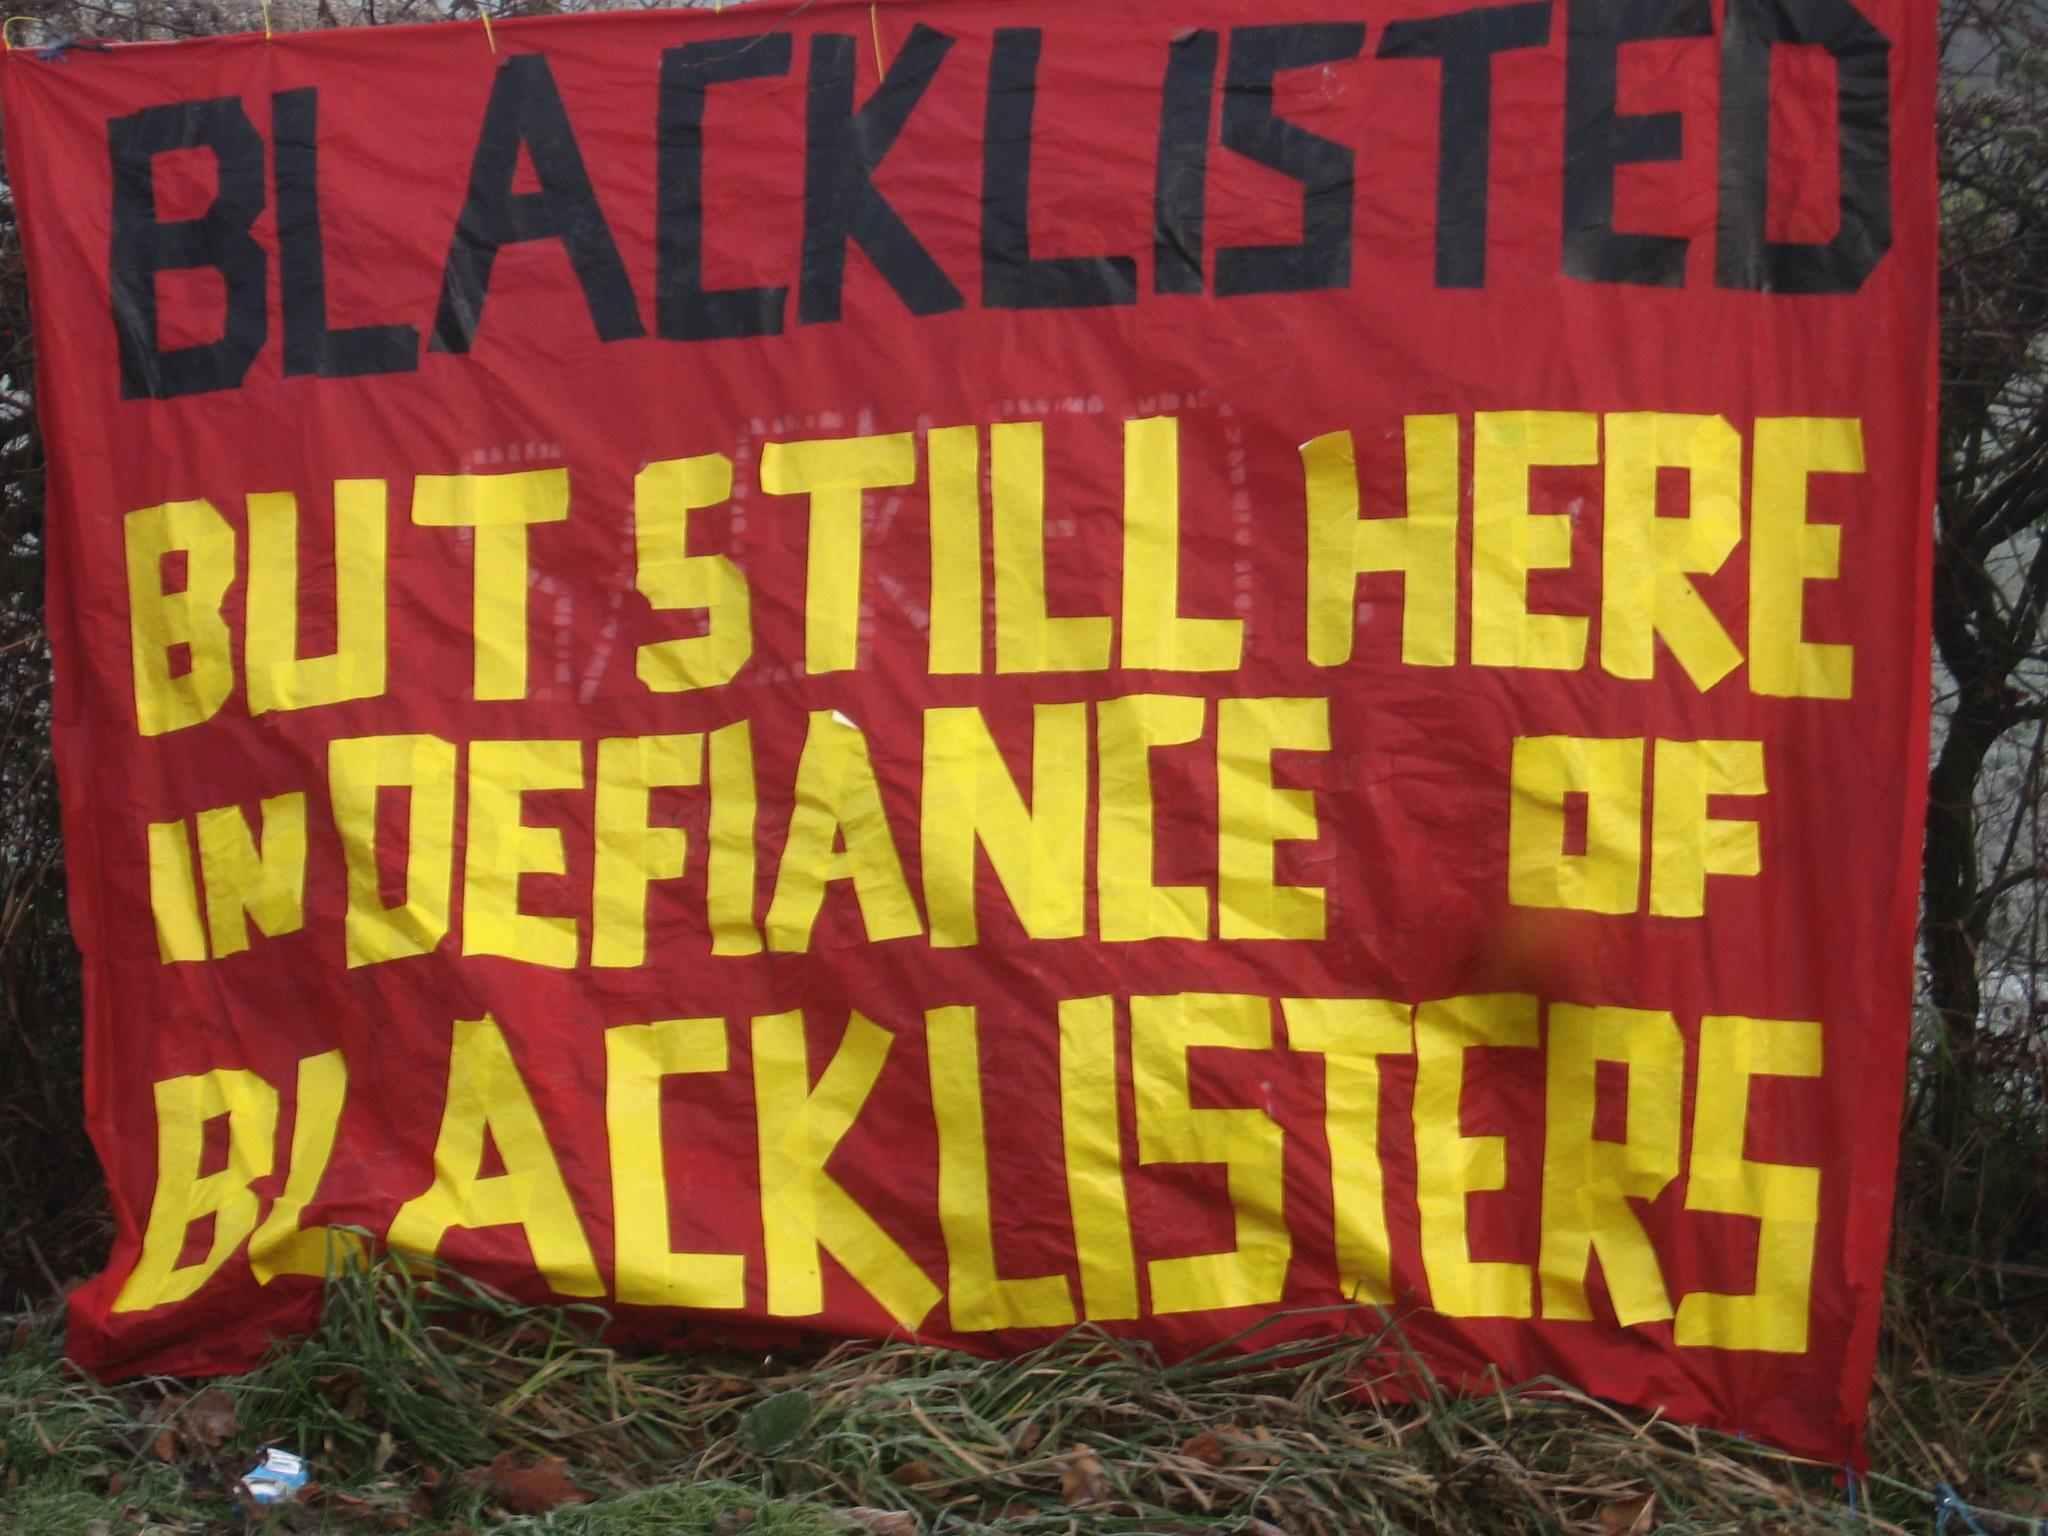 Steve A Blacklist protest